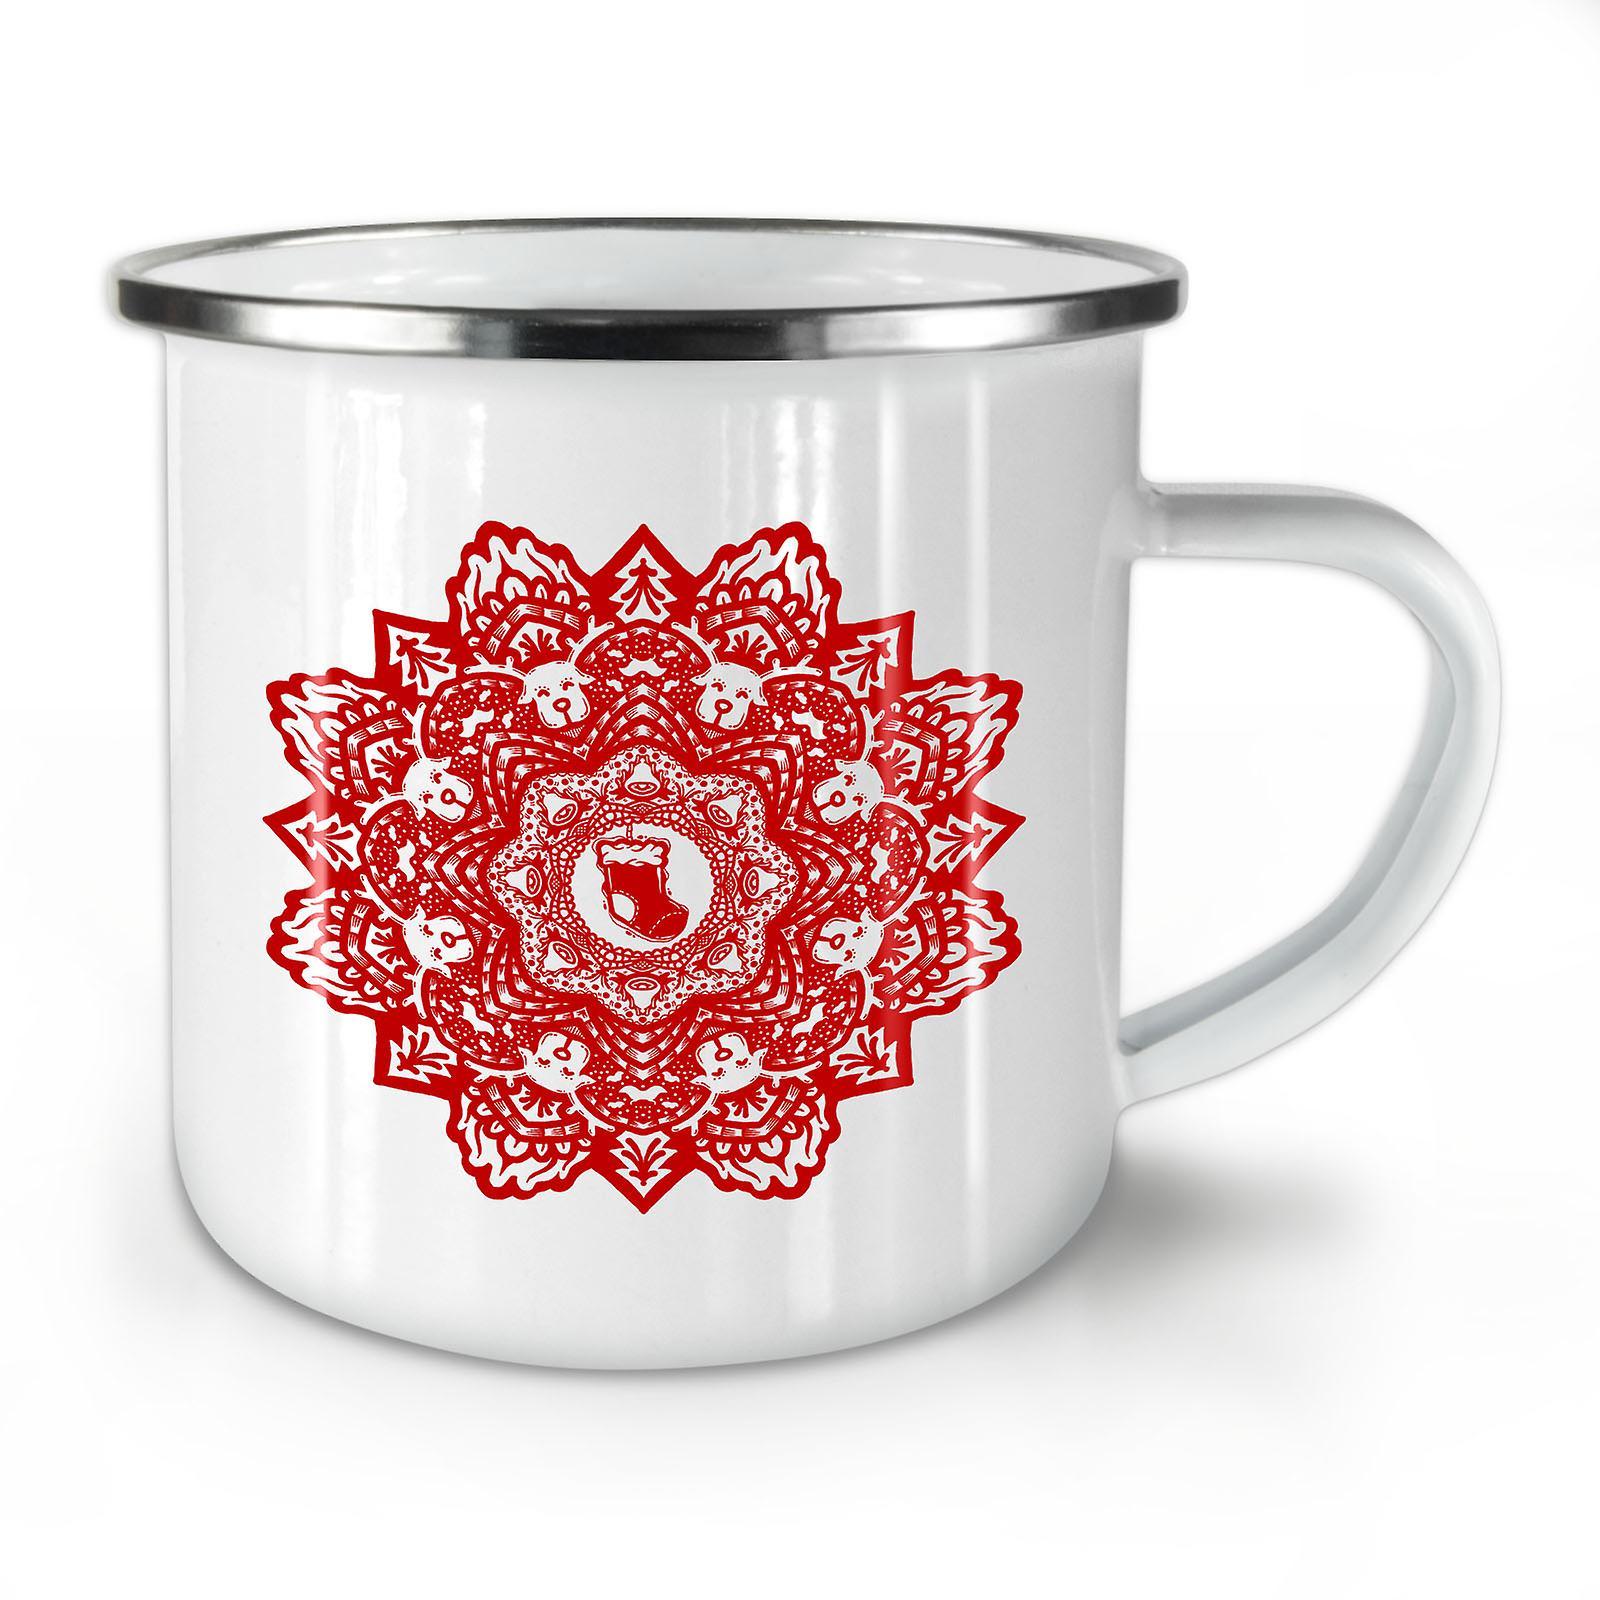 Whitetea Café Mug10 OzWellcoda Fleur Nouvelle Émail Mandala j5ALR34